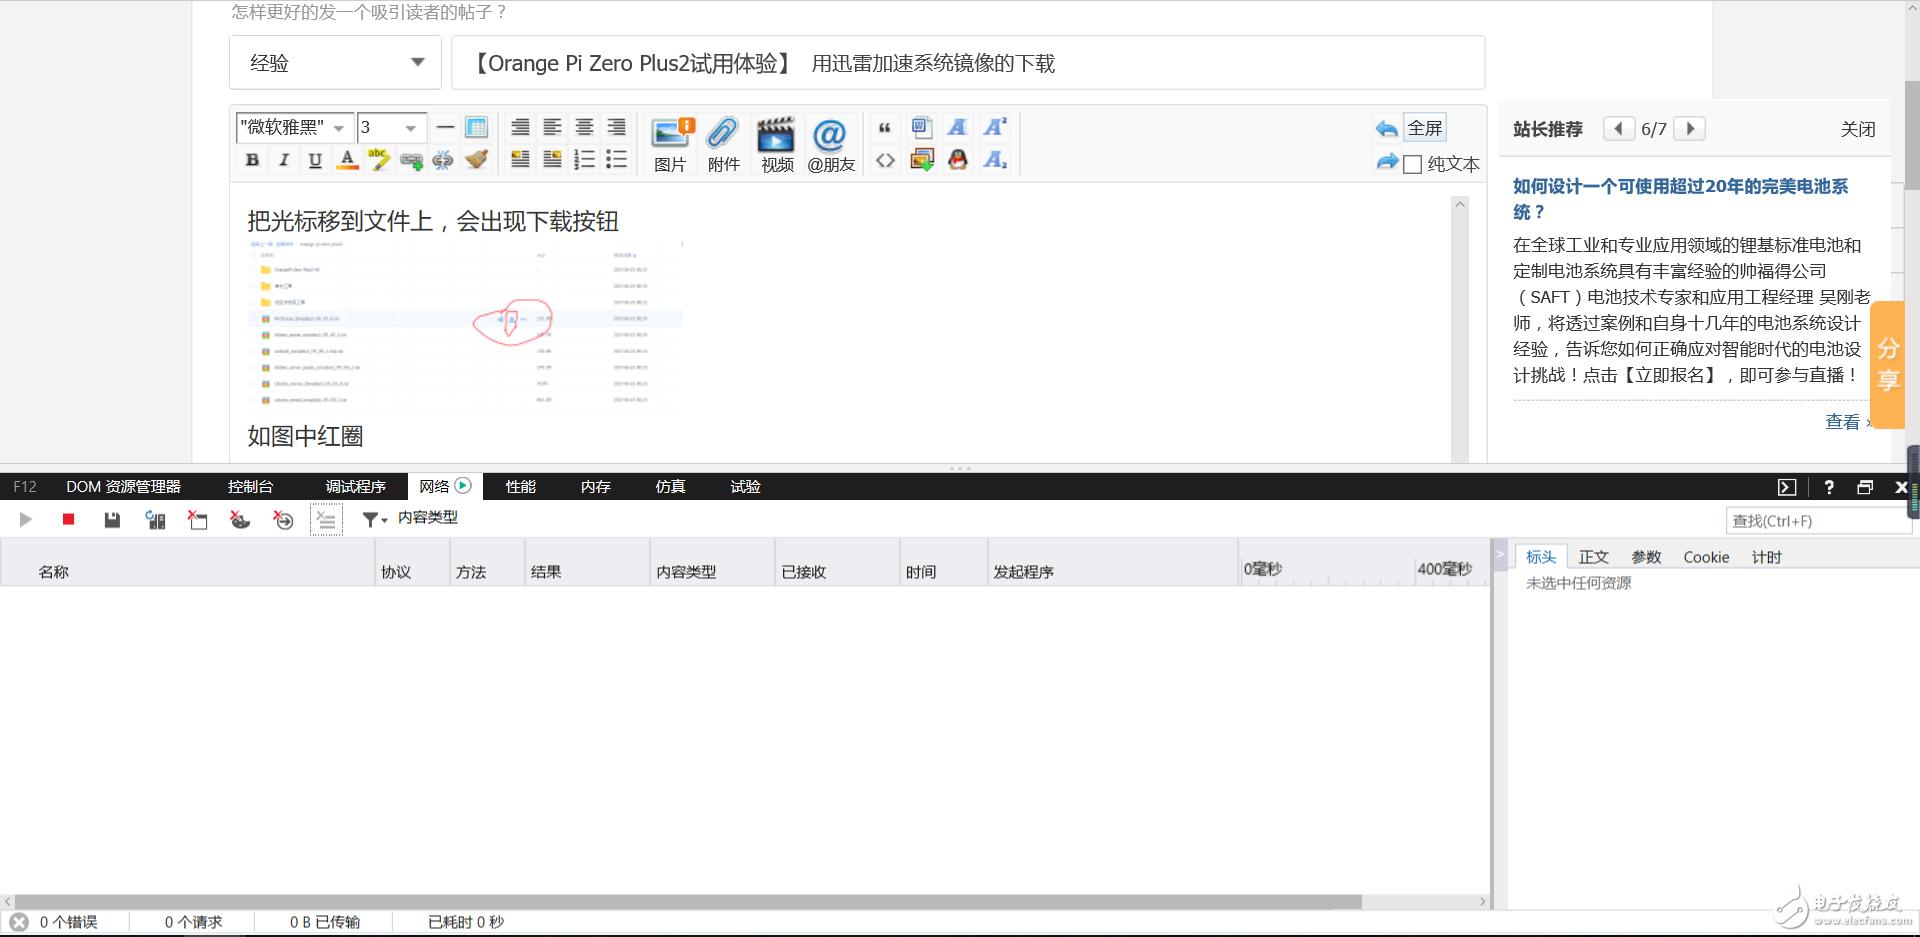 【Orange Pi Zero Plus2試用體驗】用迅雷加速系統鏡像的下載